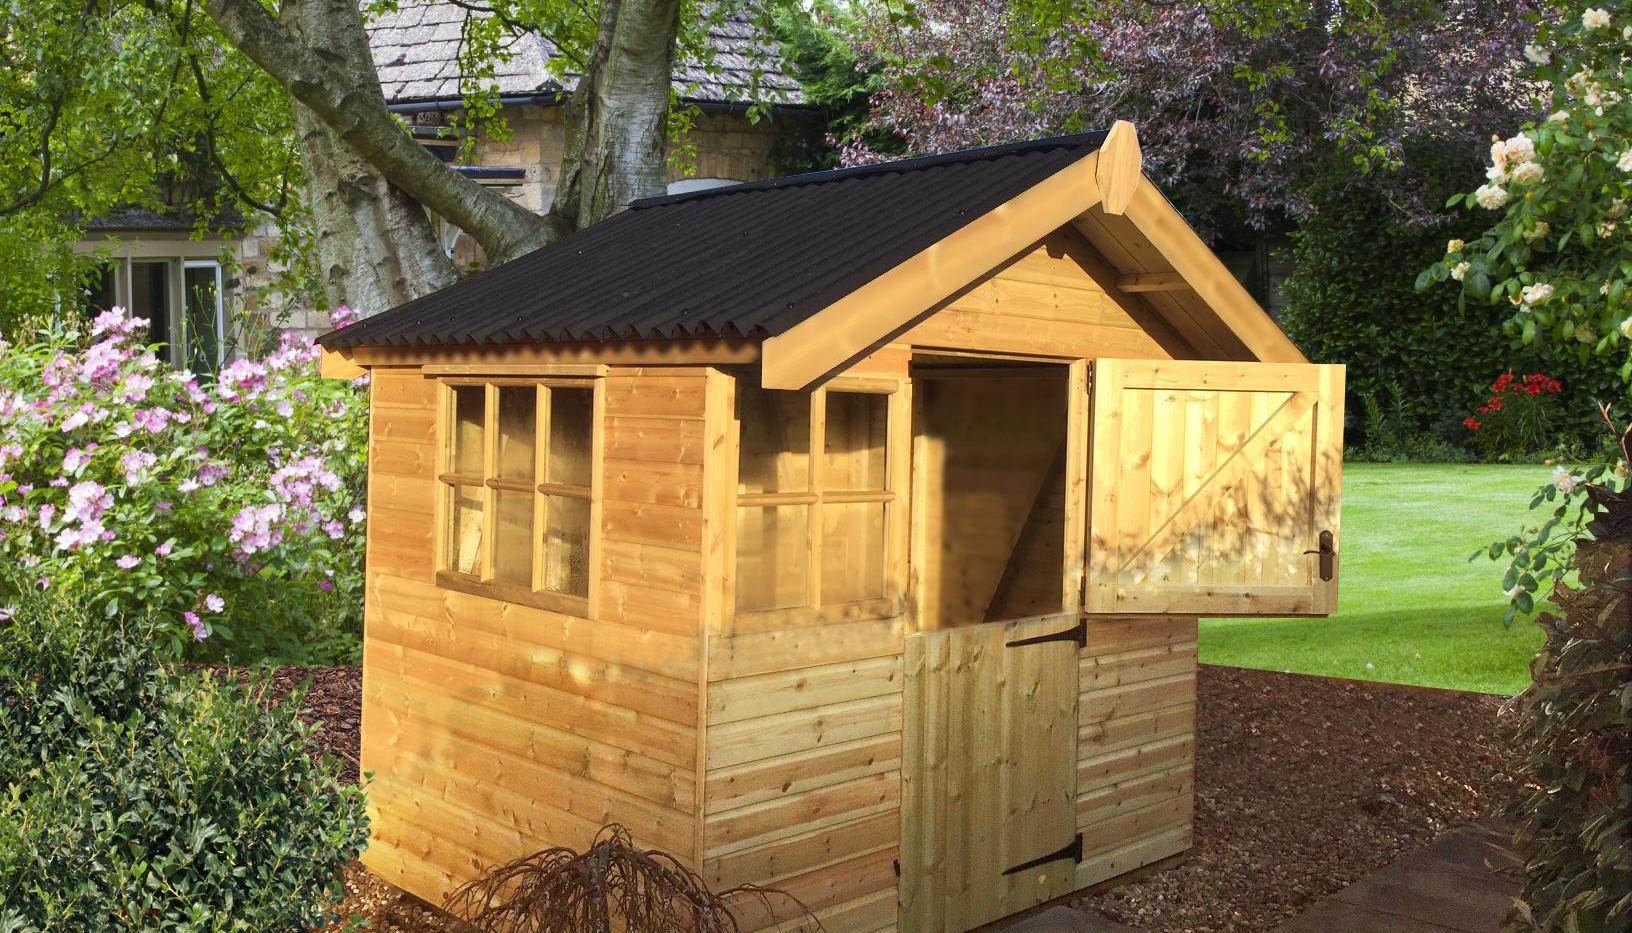 Malvern Ludlow Shed / Summerhouse Conversion